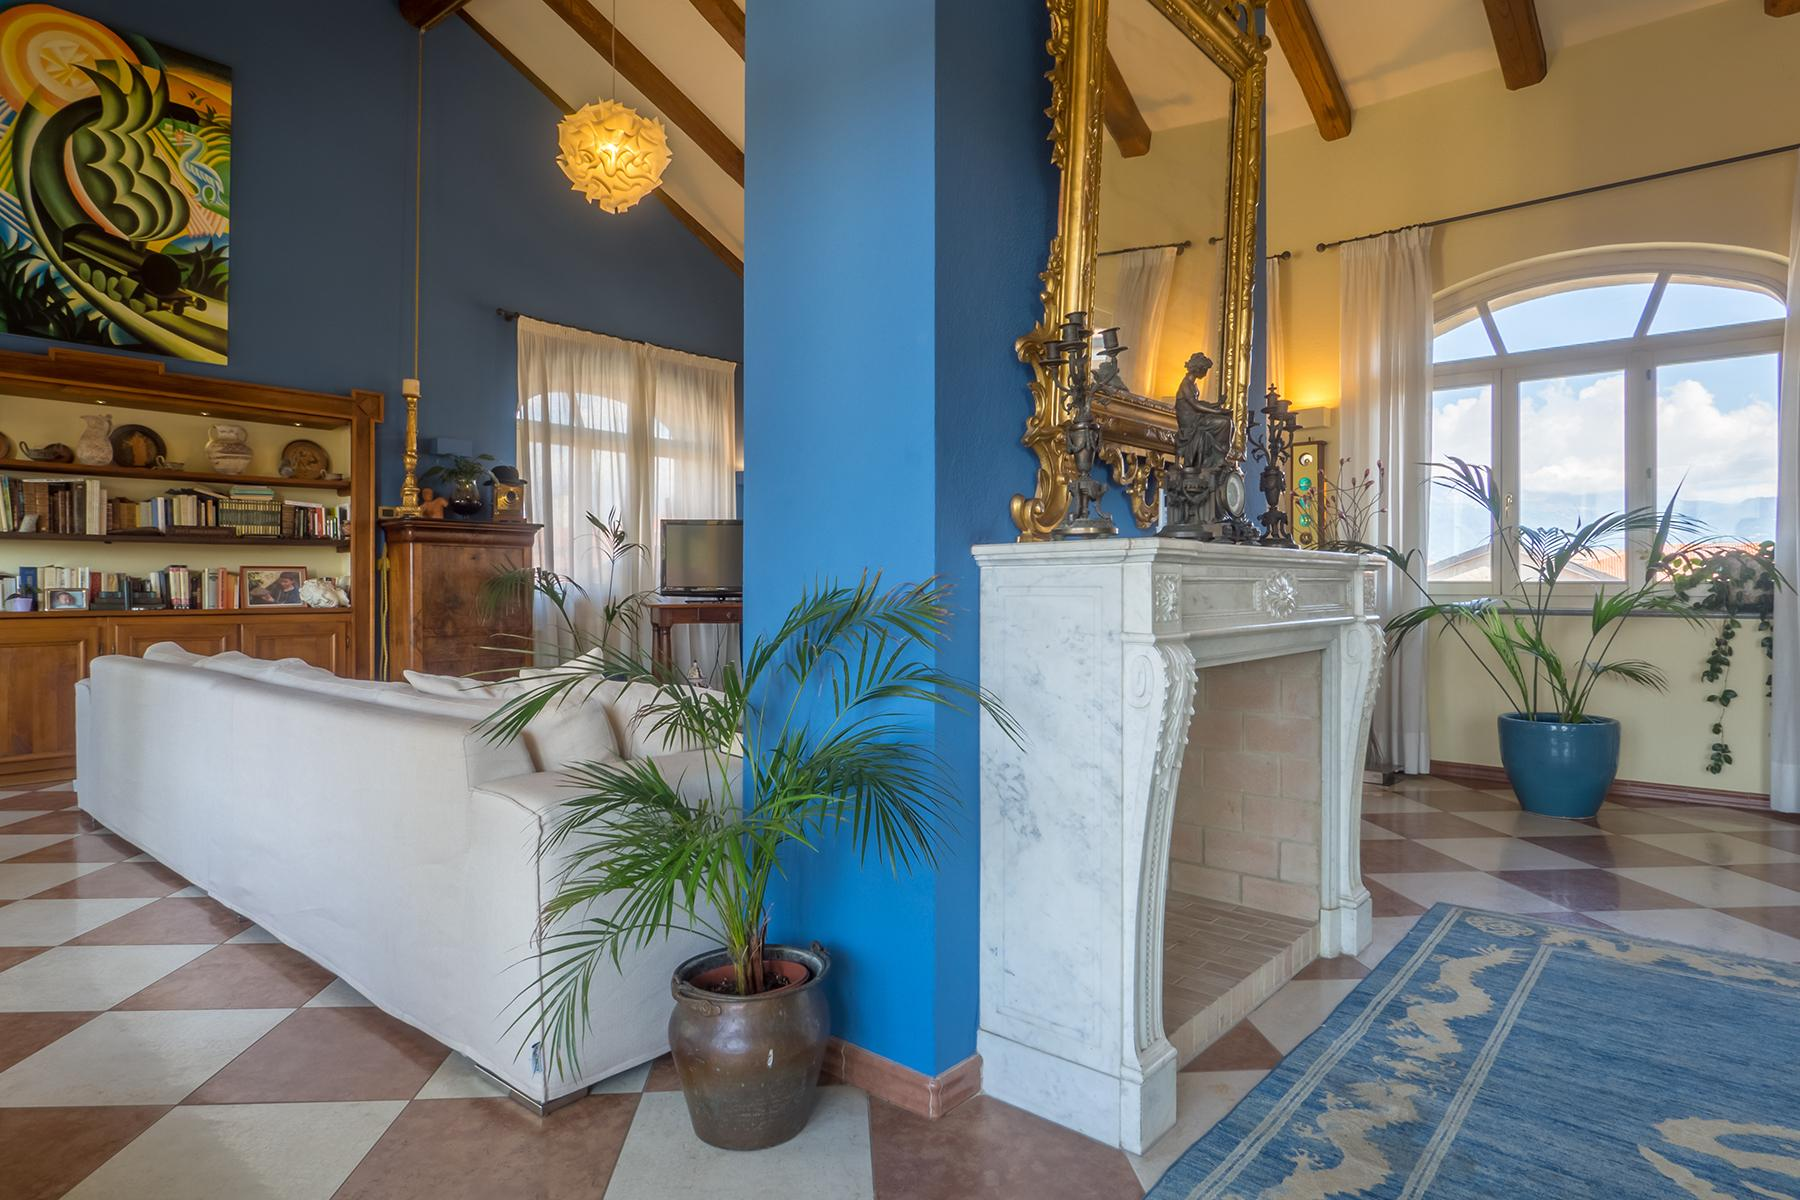 Elegant apartment in the Canavese region - 24